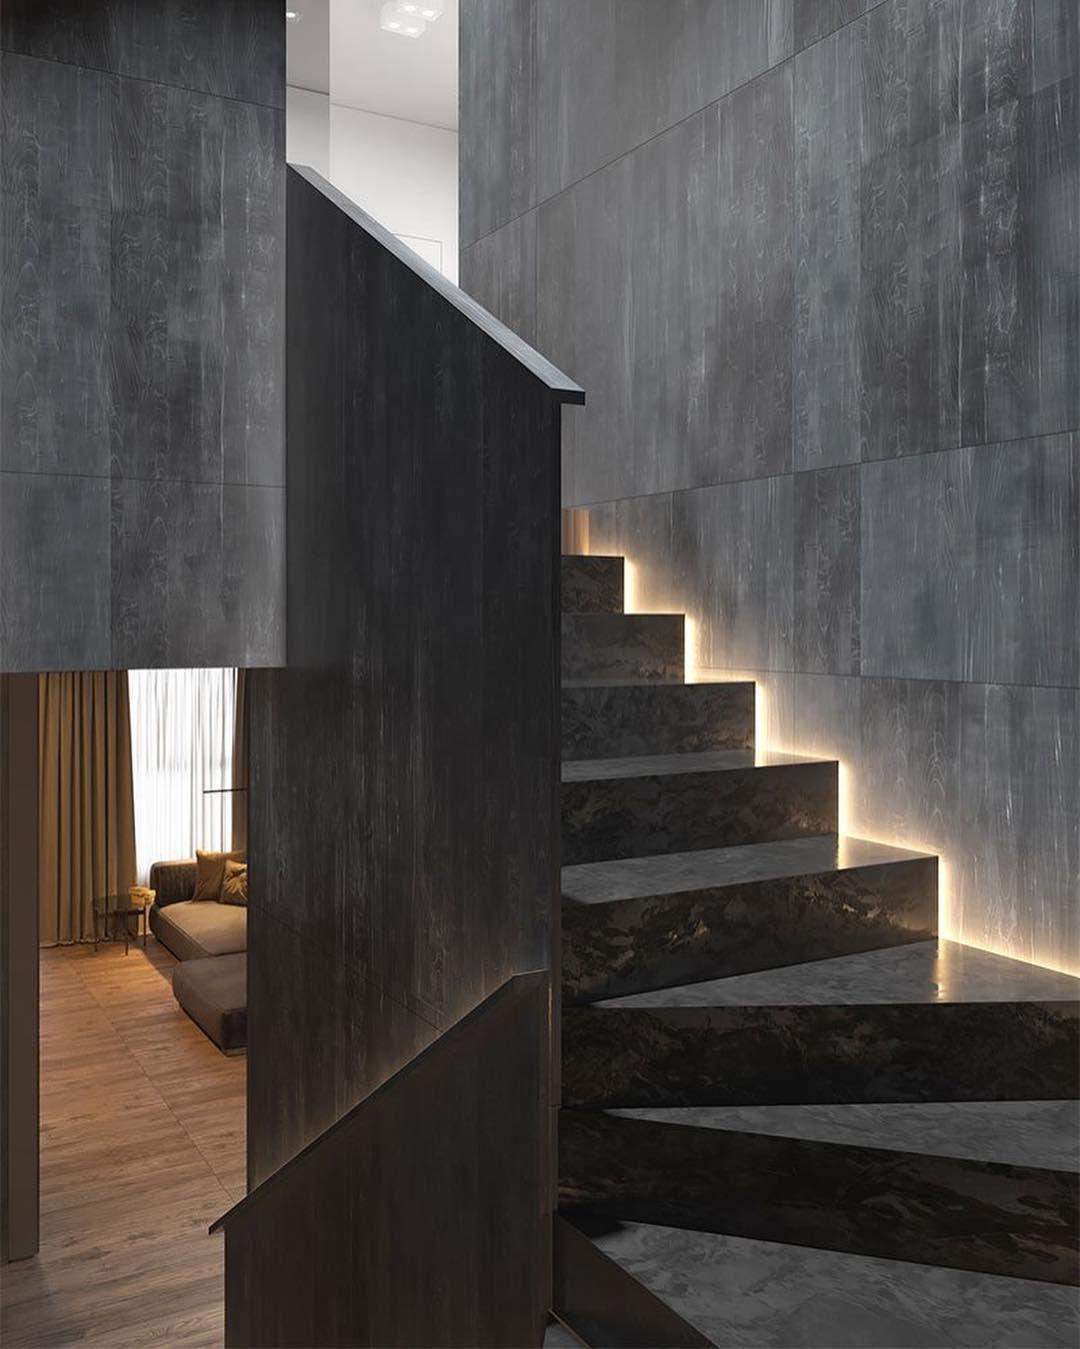 Staircase Interior Design Trap Ontwerp Huis Buitenkant Design Trap Ideeen